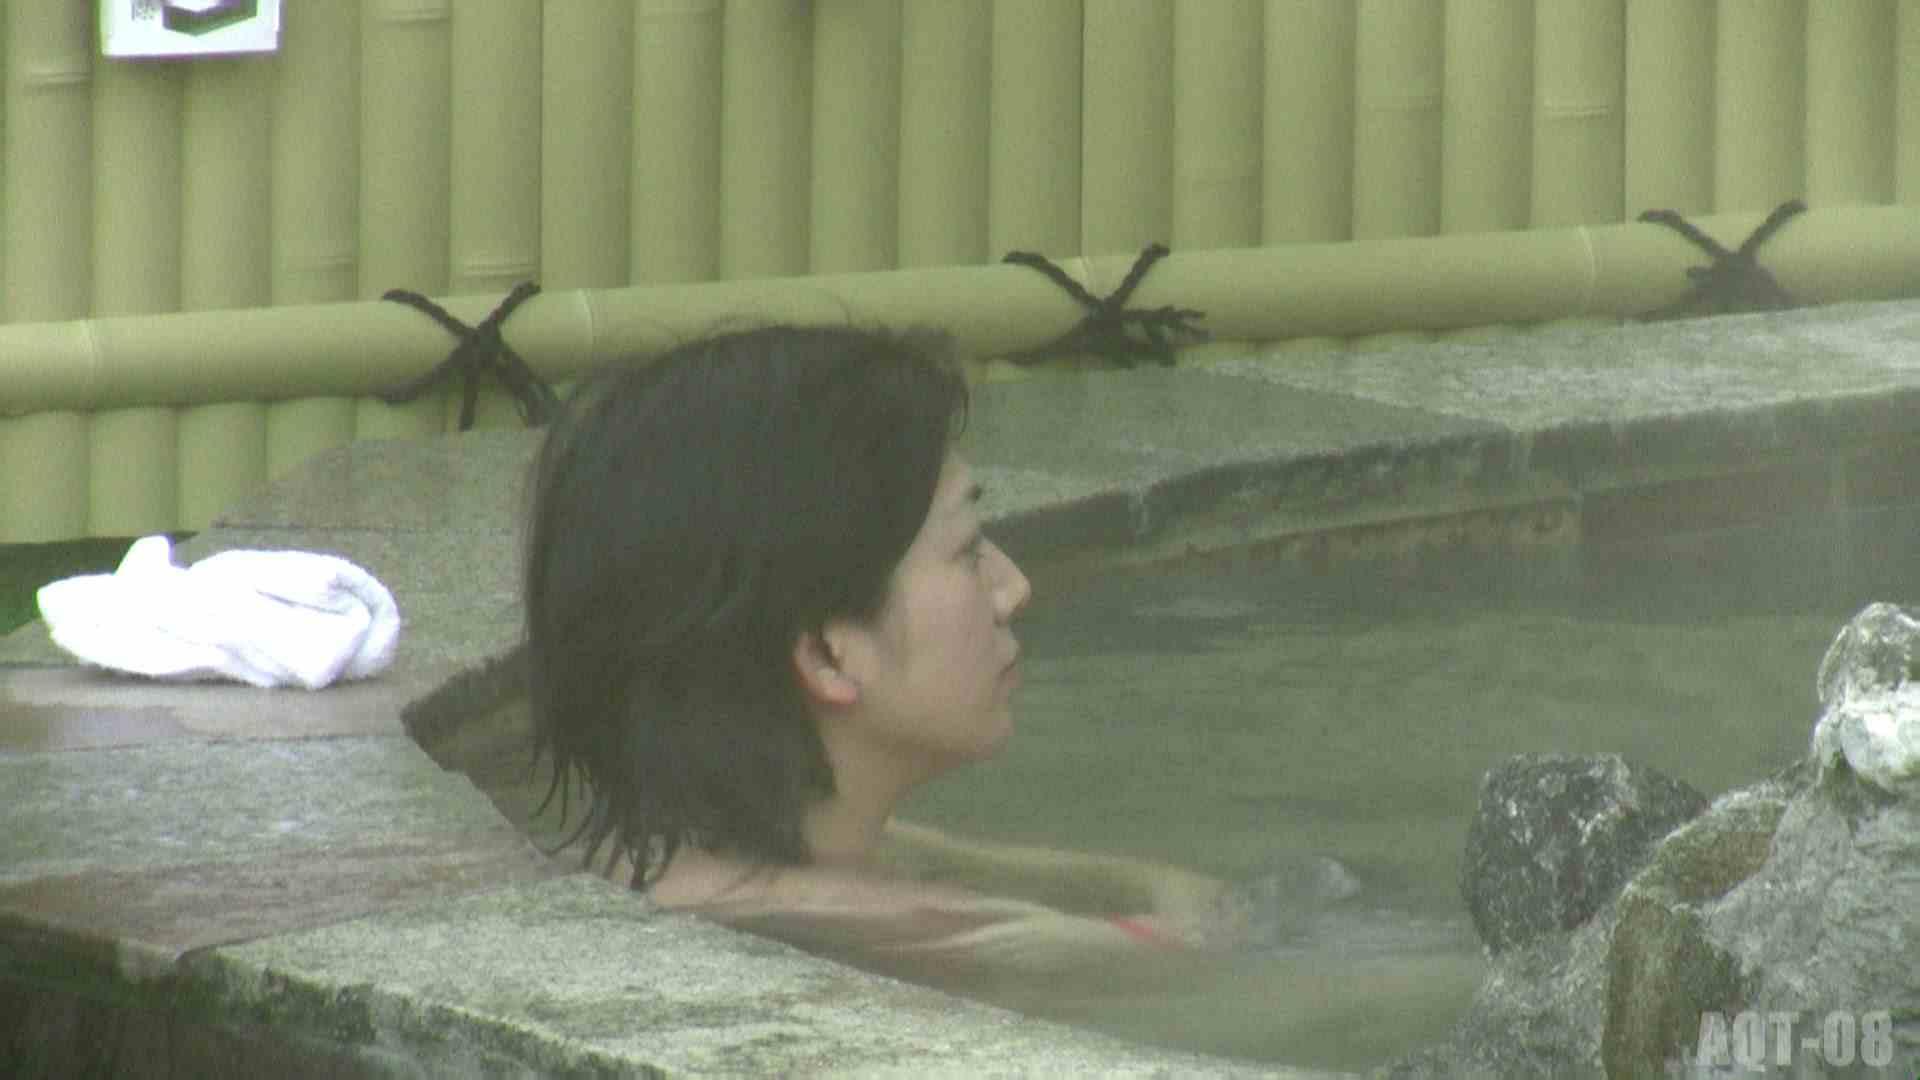 Aquaな露天風呂Vol.776 盗撮 | HなOL  60pic 53